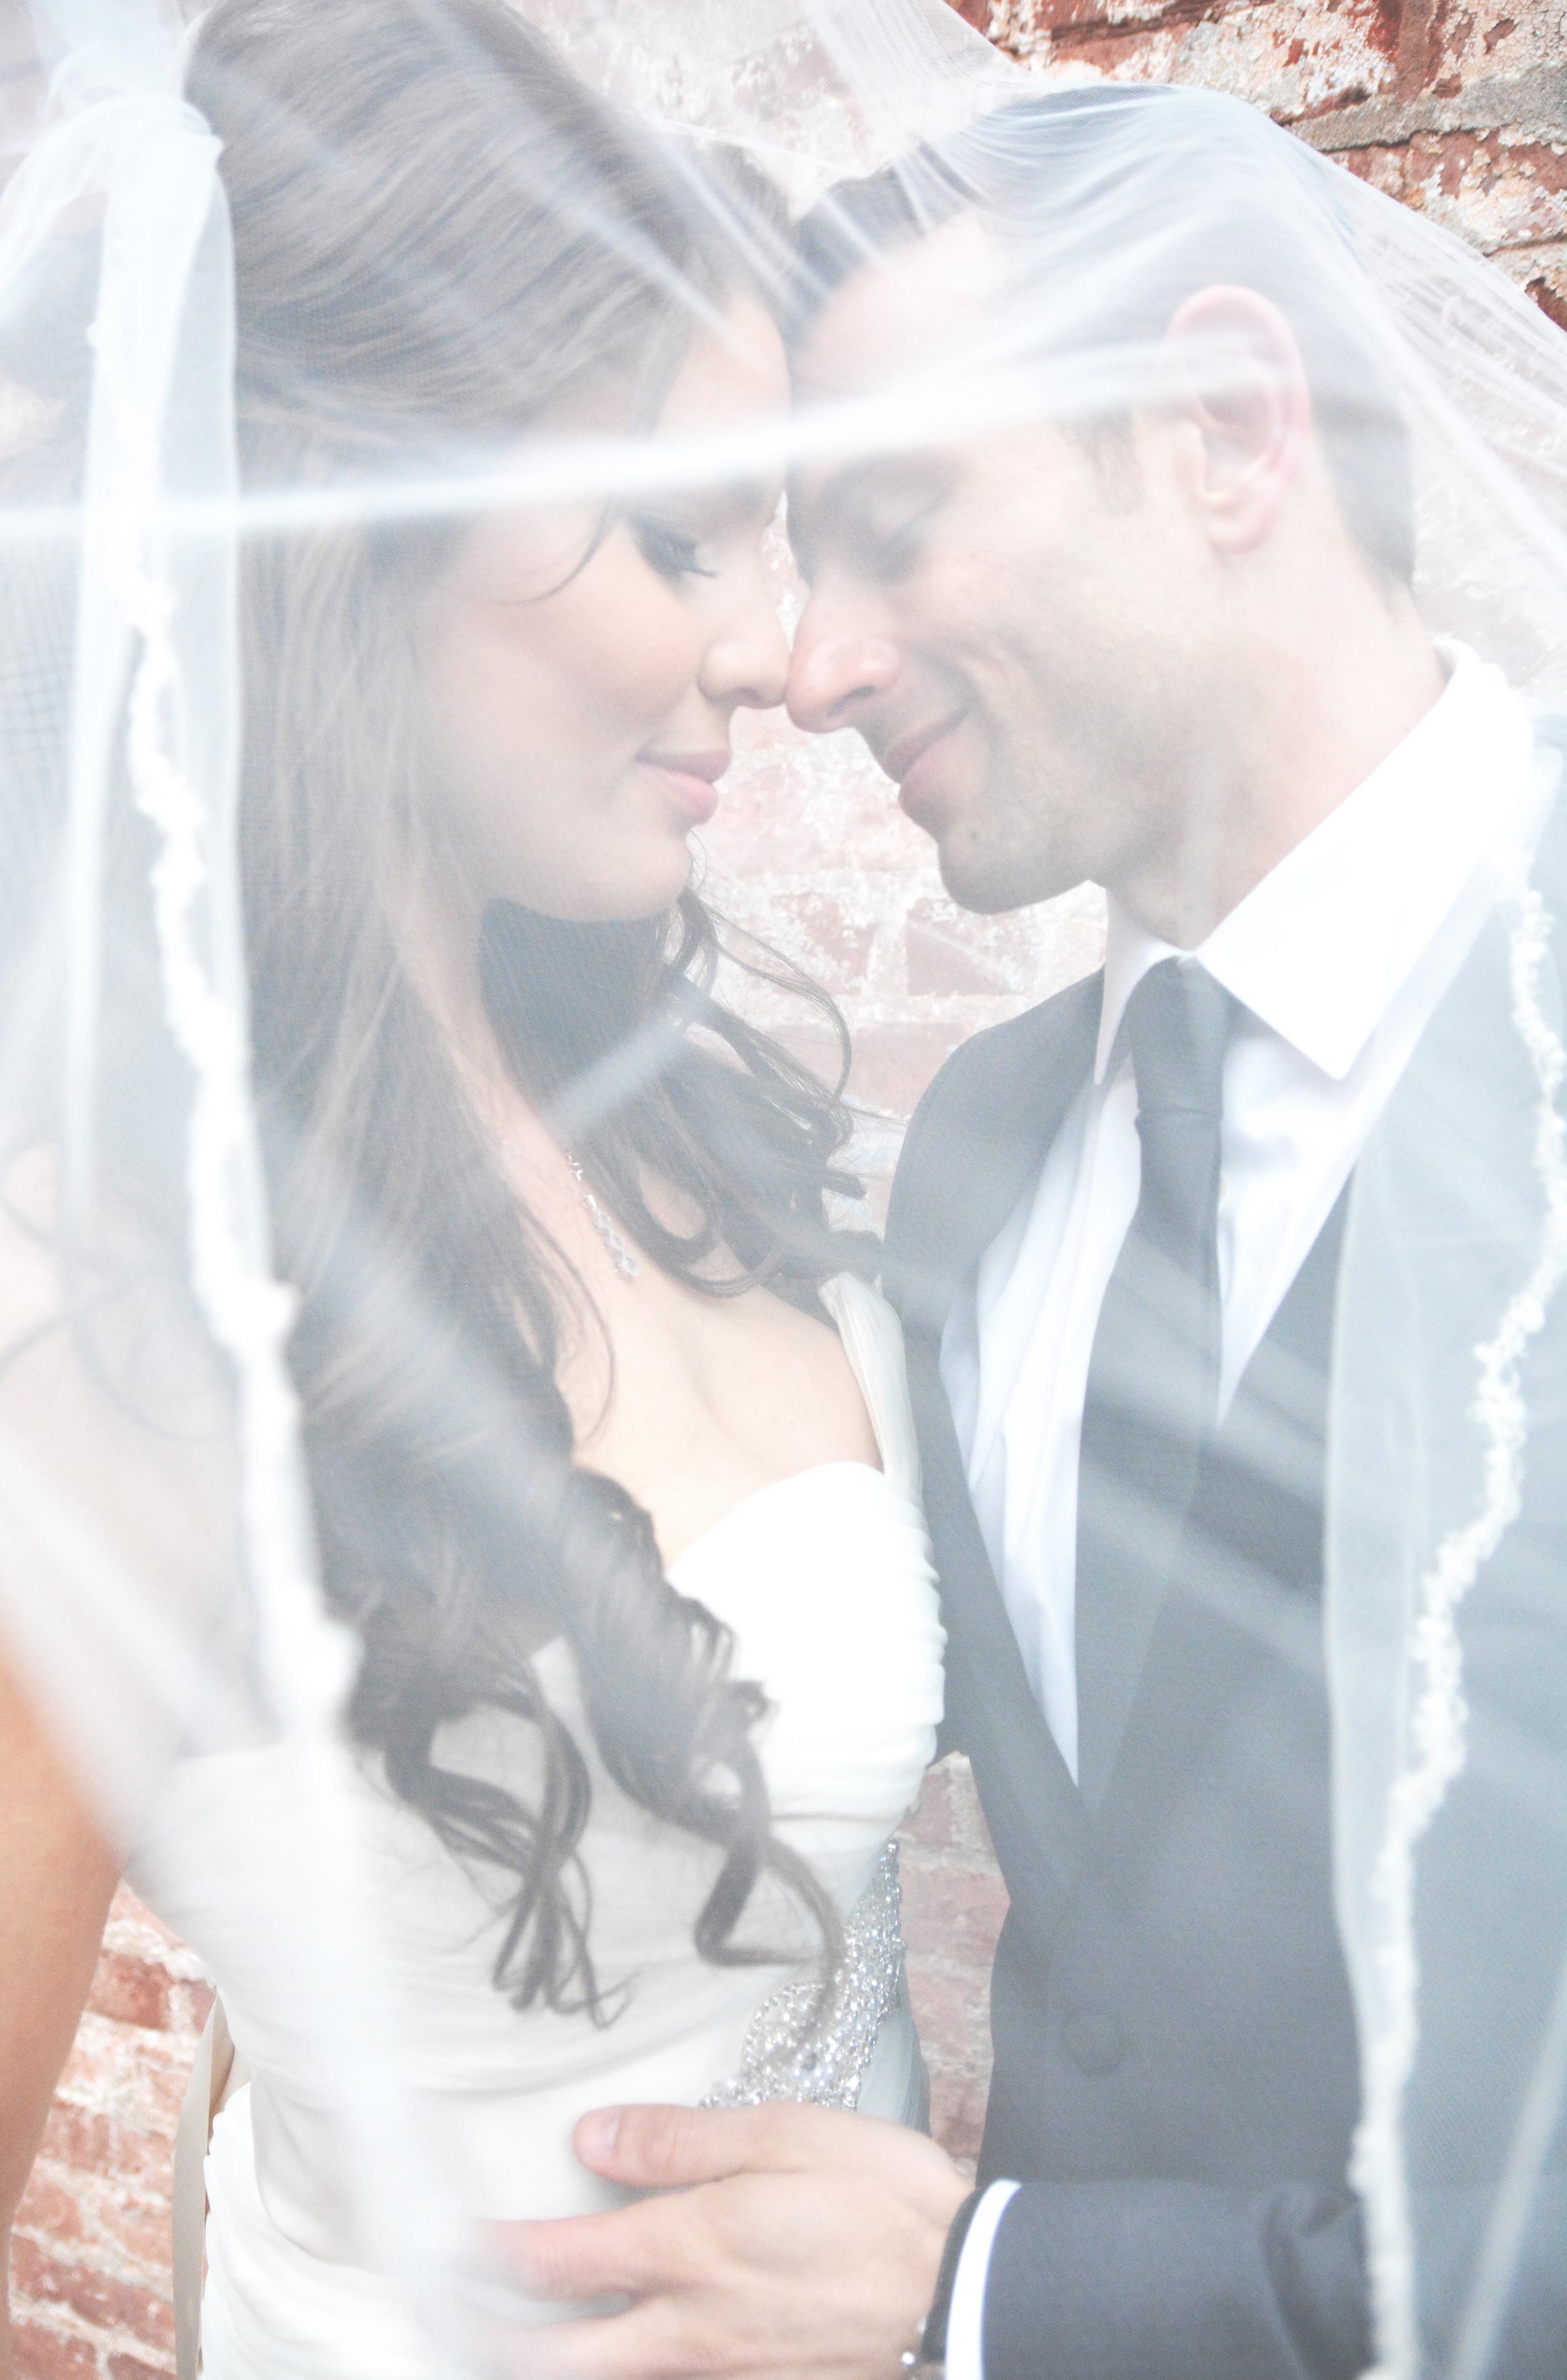 Savannah Whitefield Square Wedding Photography - Jahziel + Iggy - Six Hearts Photography_0843.jpg